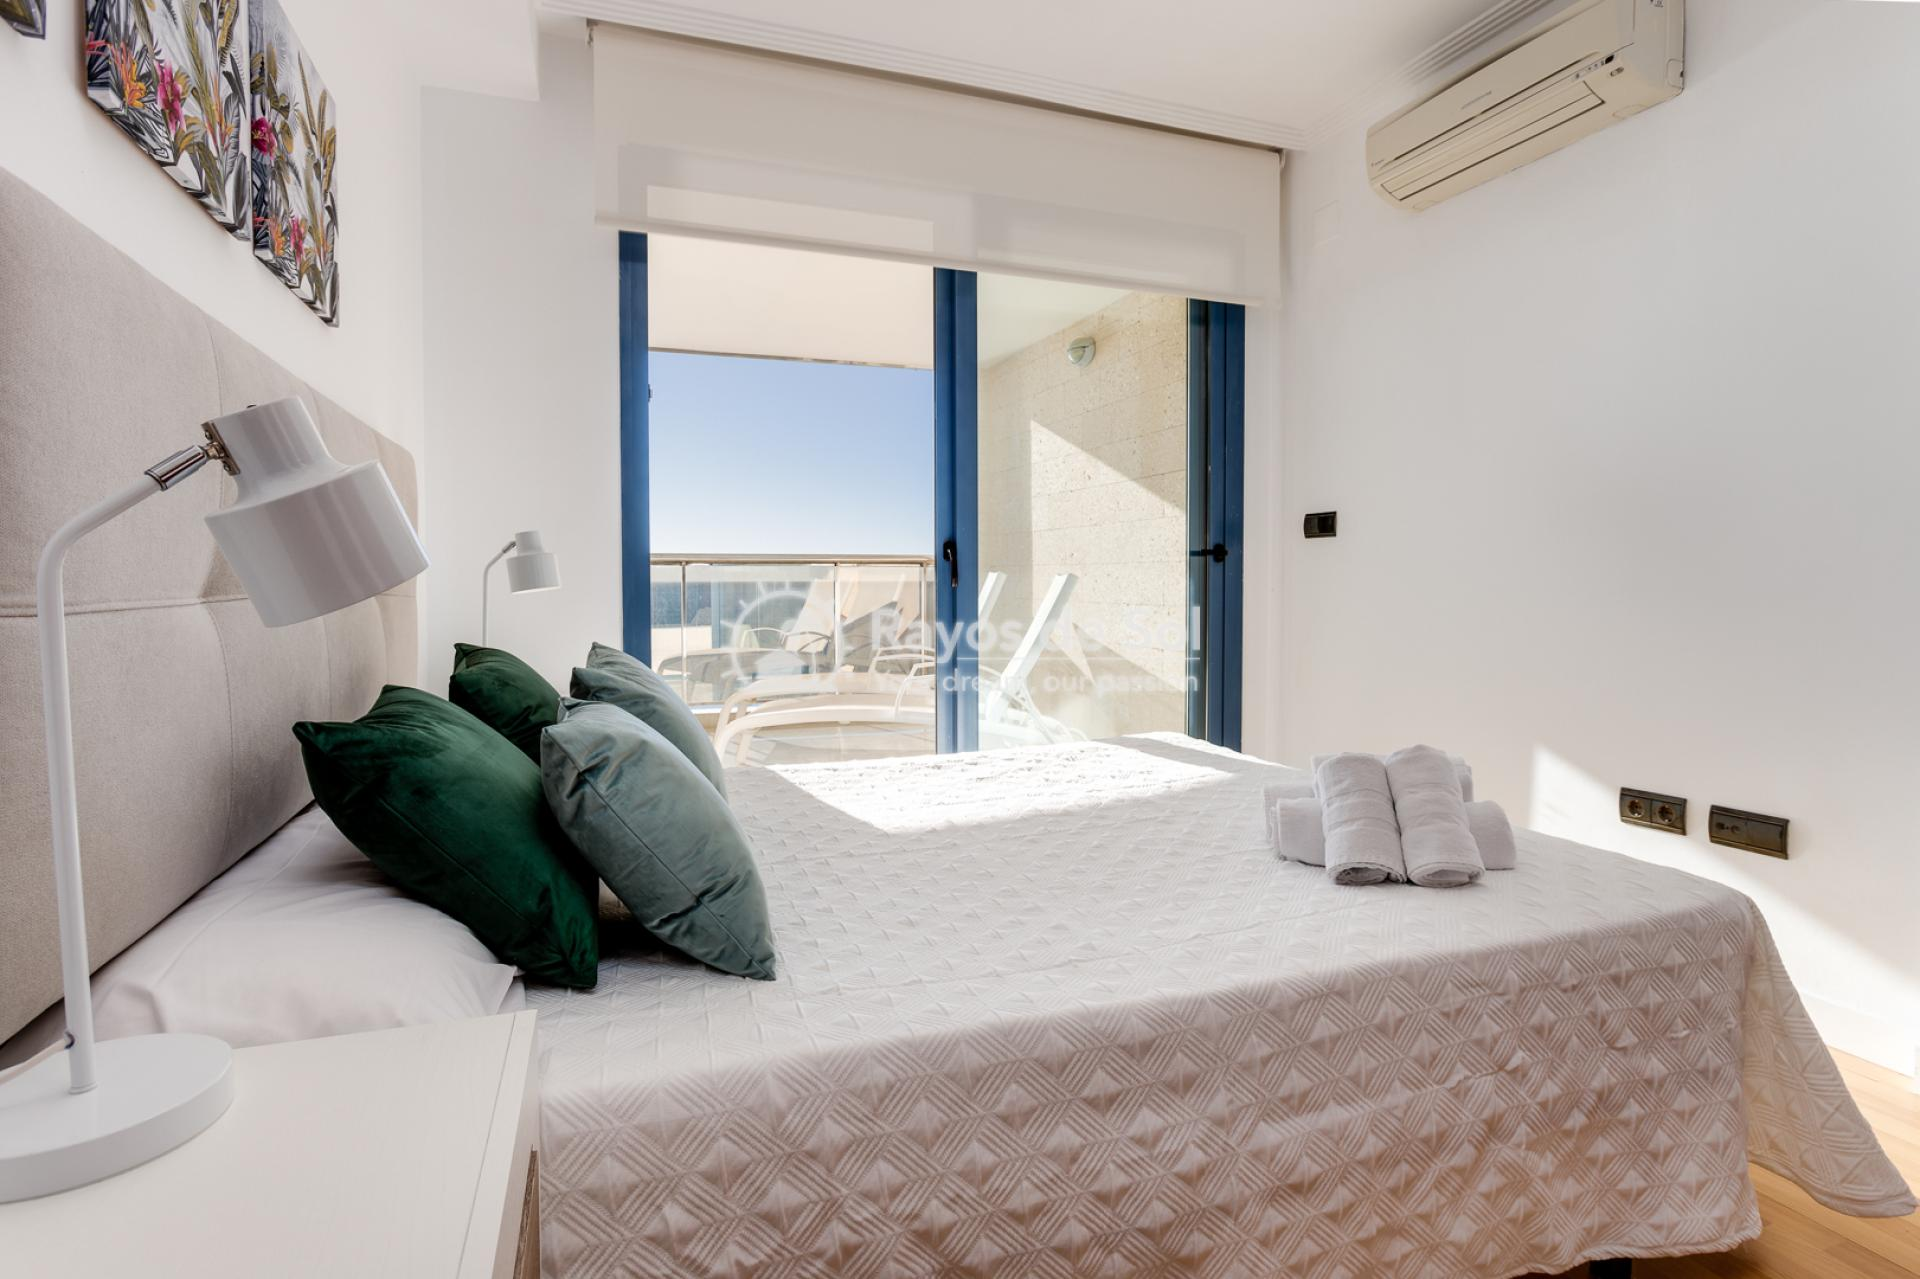 Turnekey first line apartments  in Altea, Costa Blanca (Alteabeach) - 28